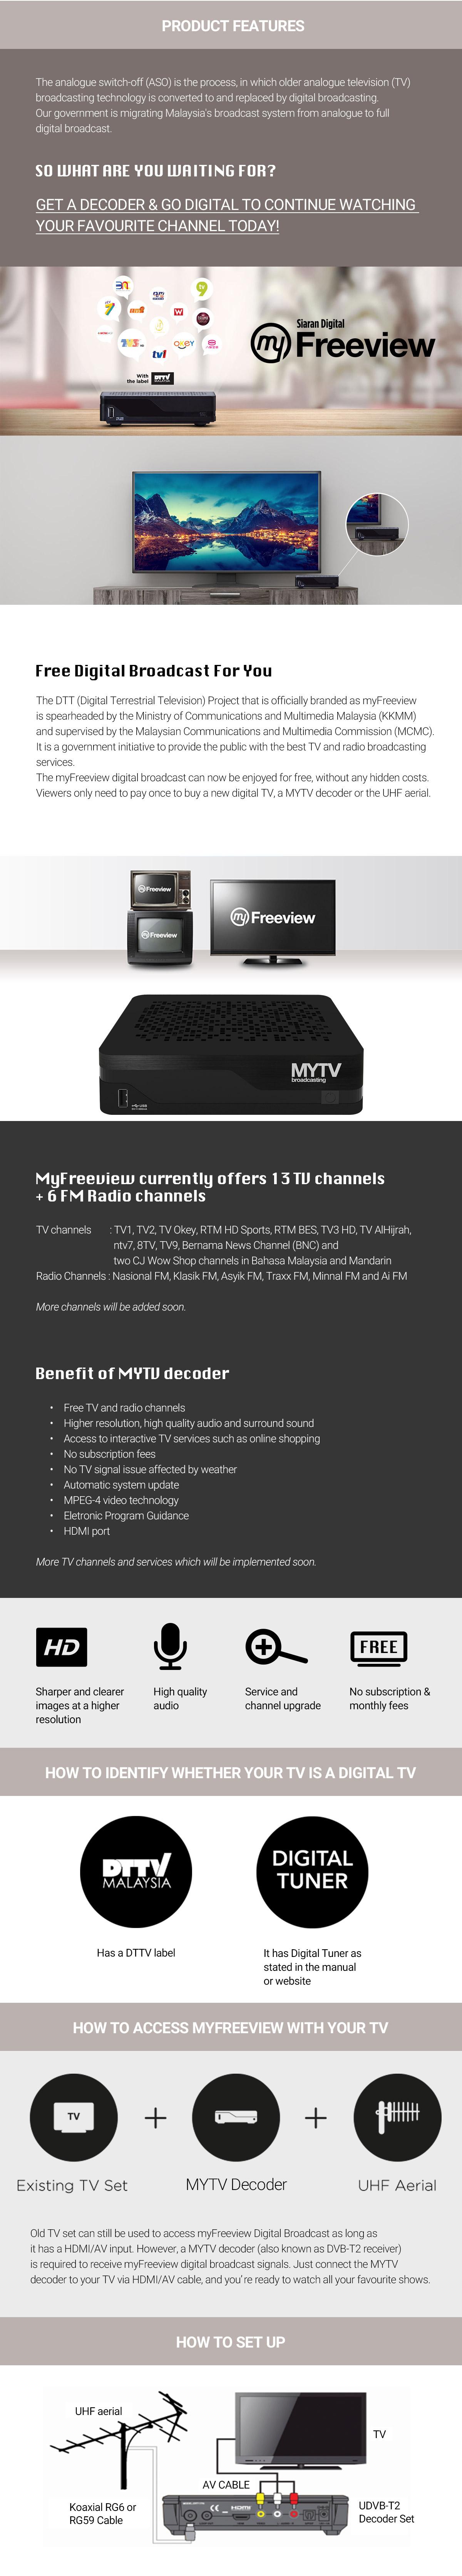 MyTV Decoder